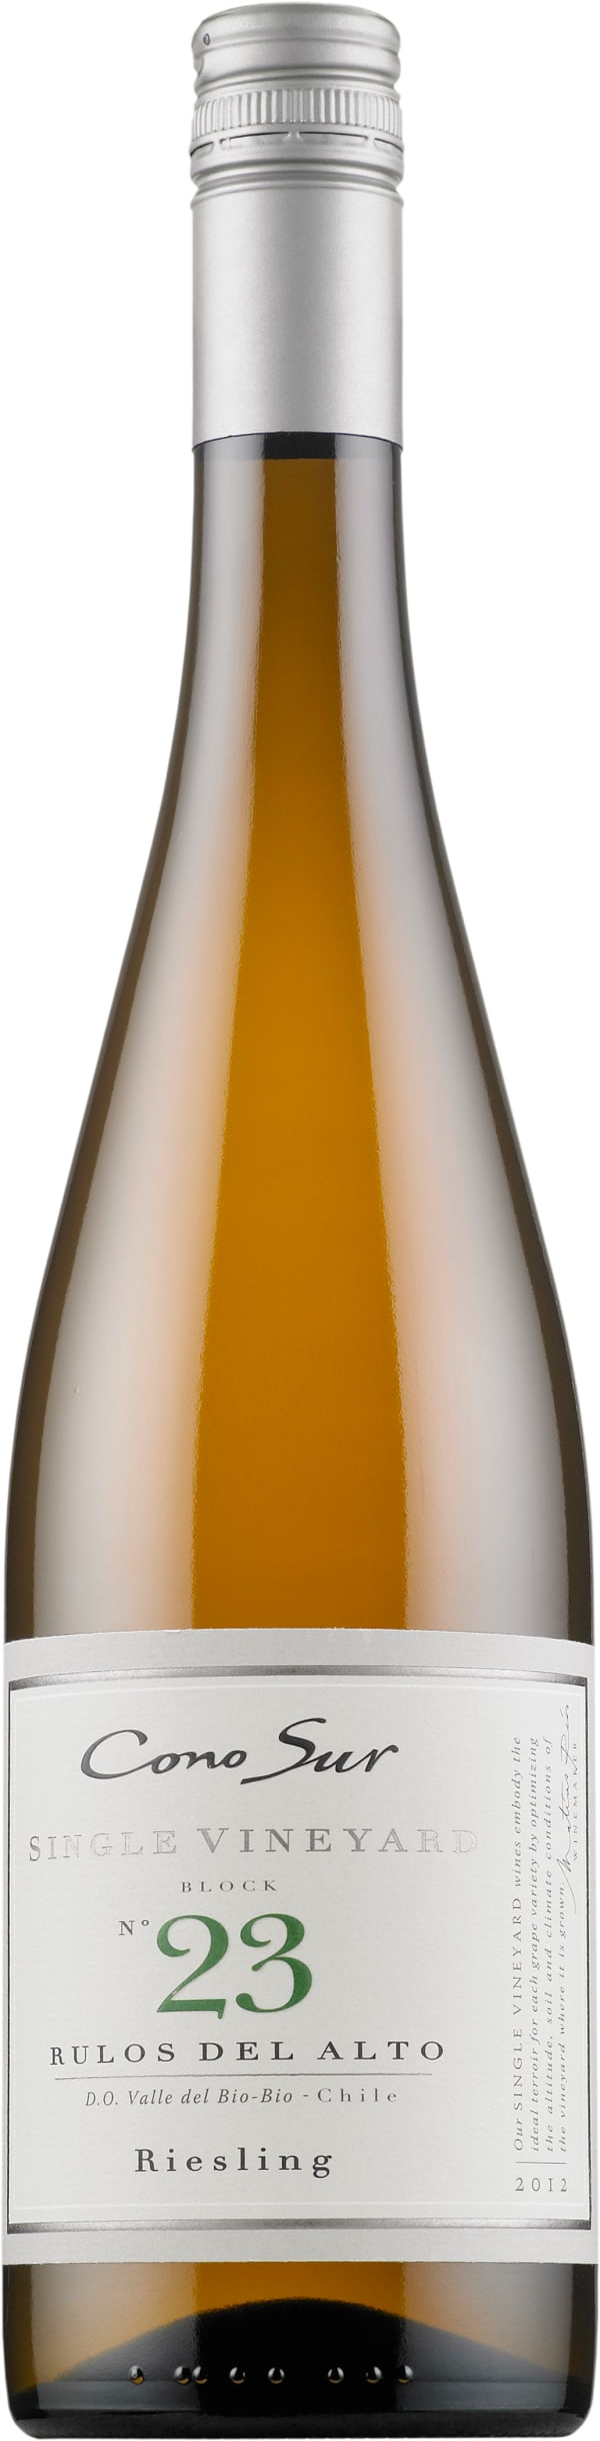 Cono Sur Single Vineyard Block 23 Riesling 2019